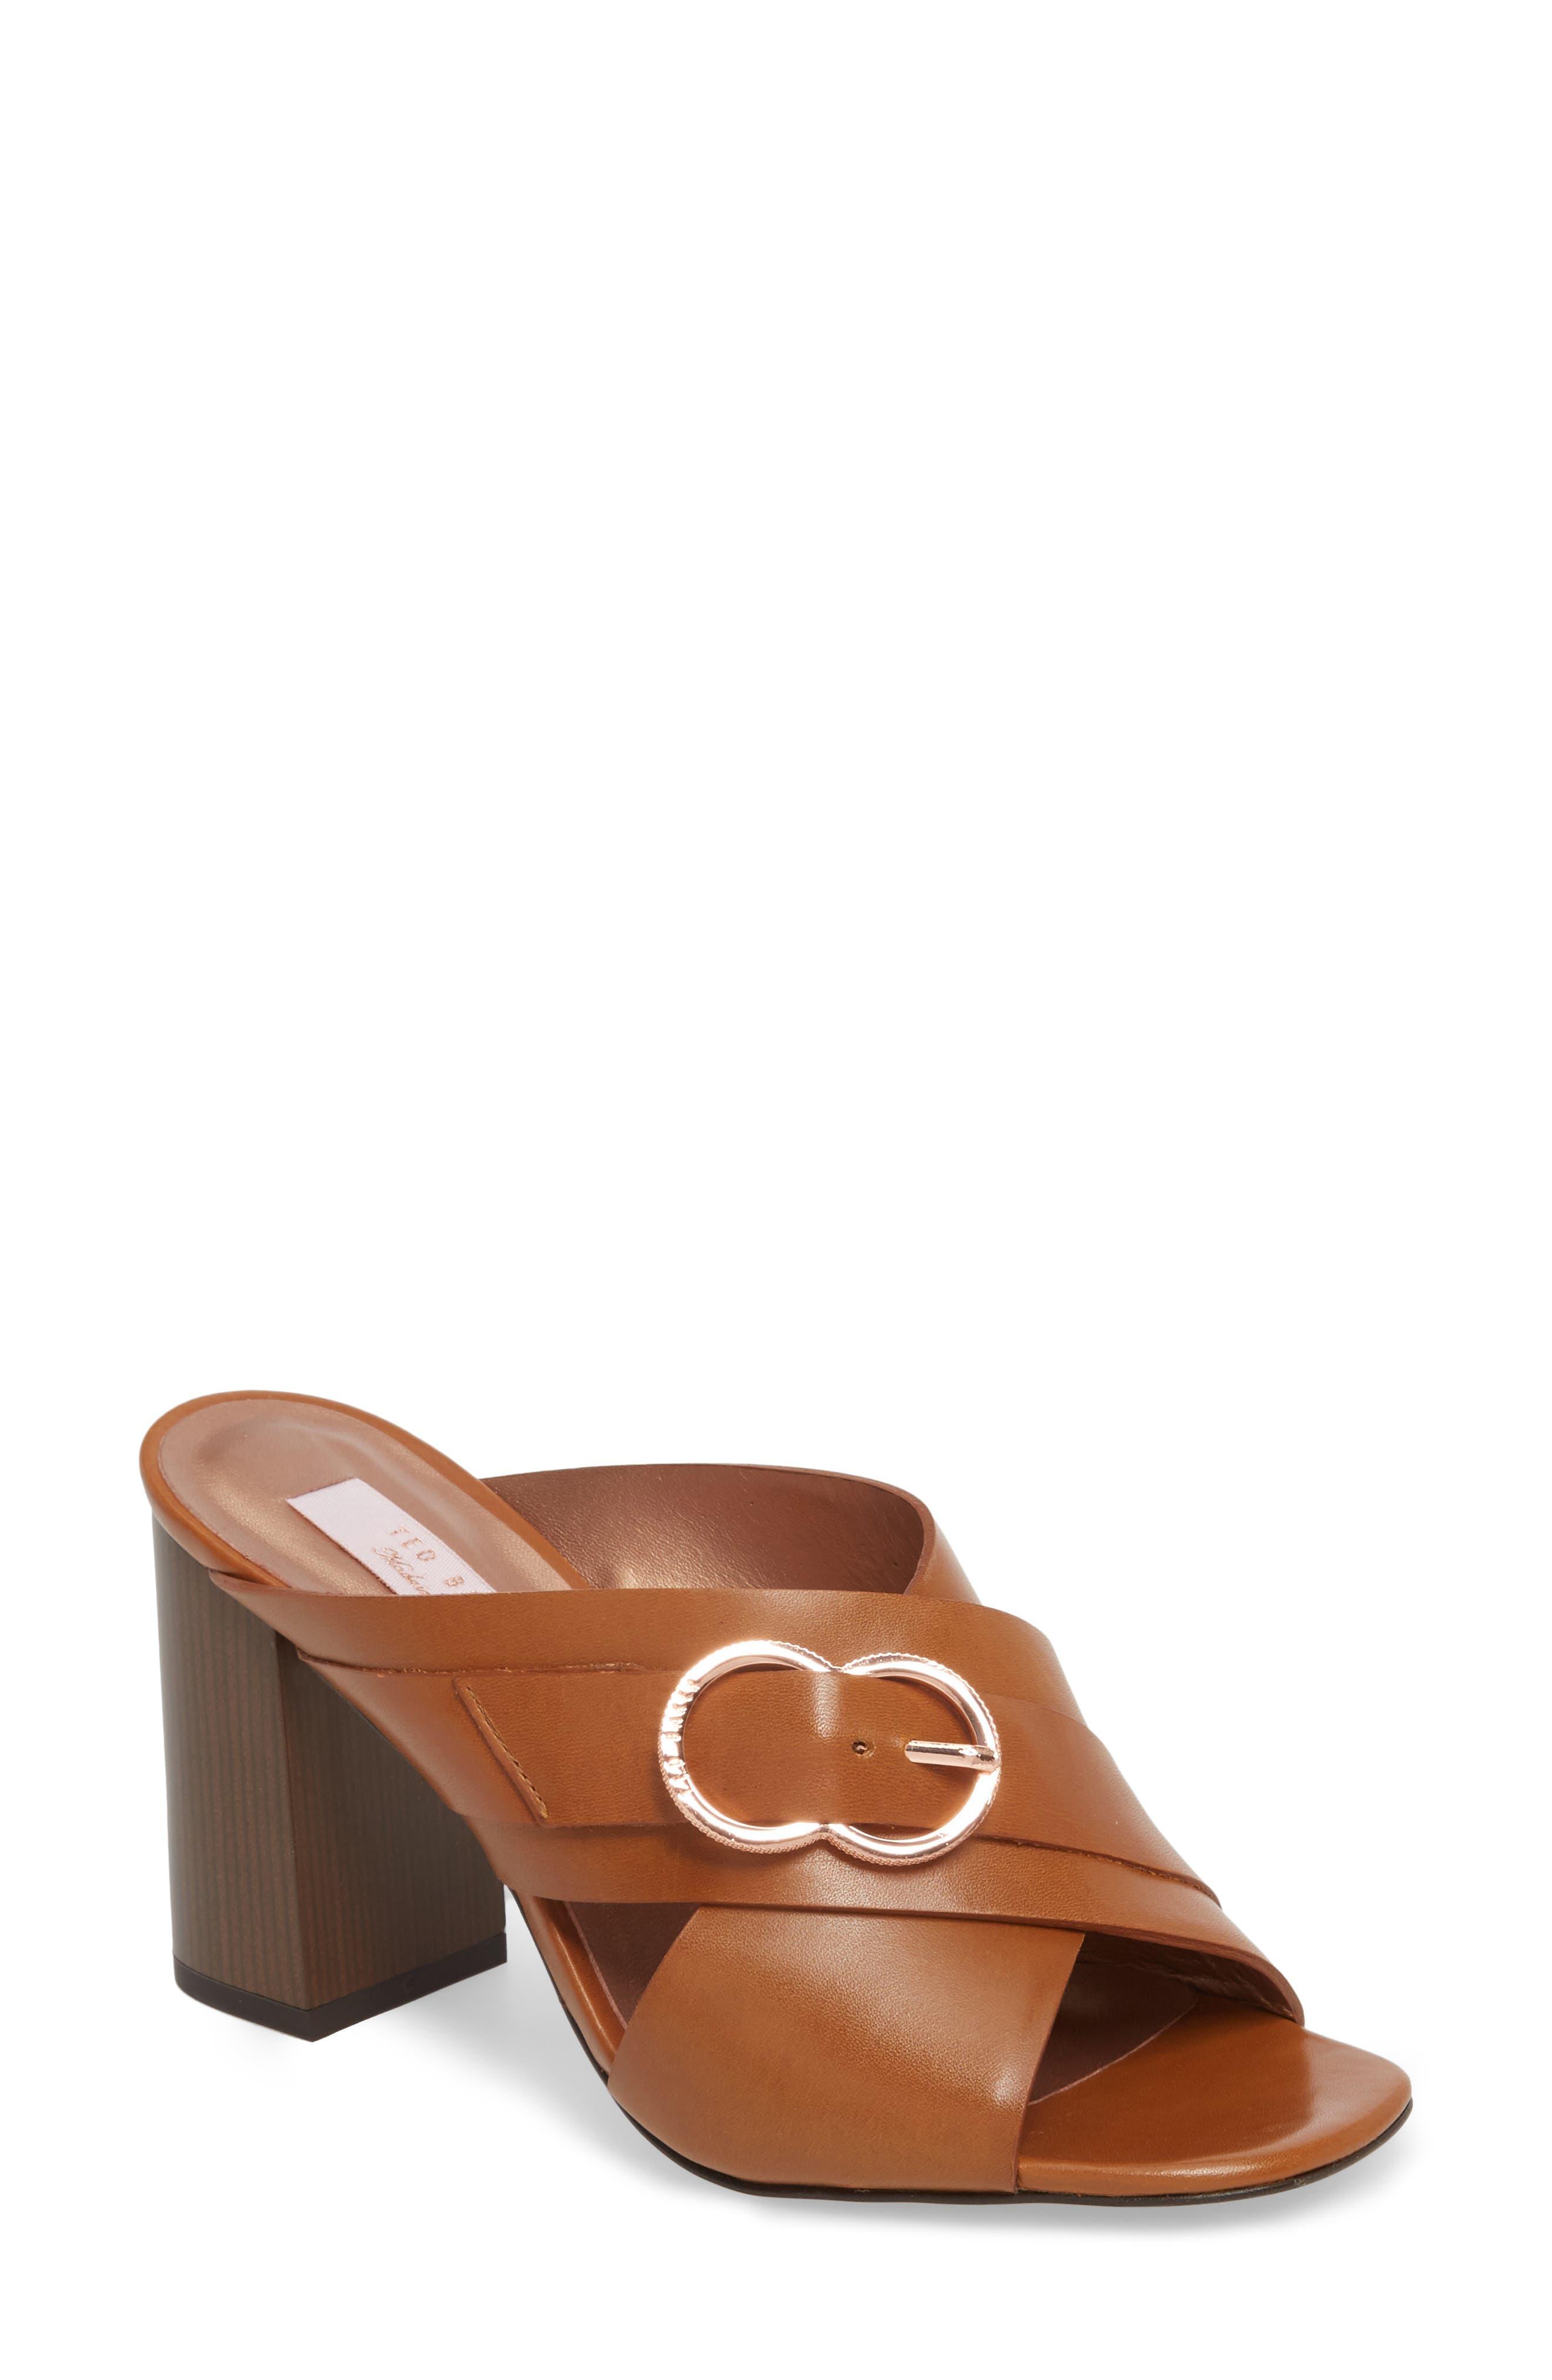 Maladas Slide Sandal,                         Main,                         color, Tan Leather